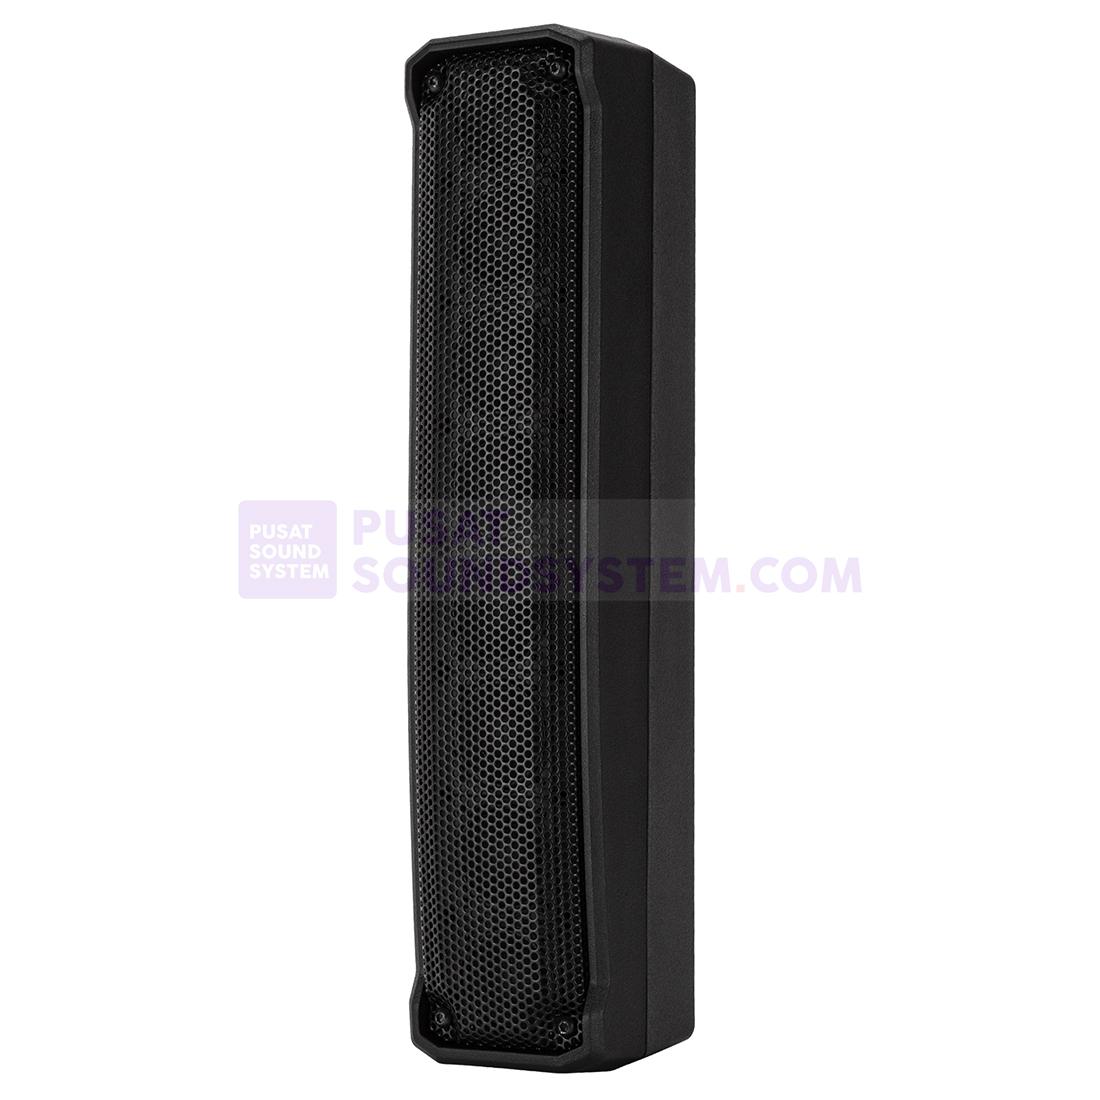 Jual RCF EVOX J8 Portable Column Speaker 12-Inch